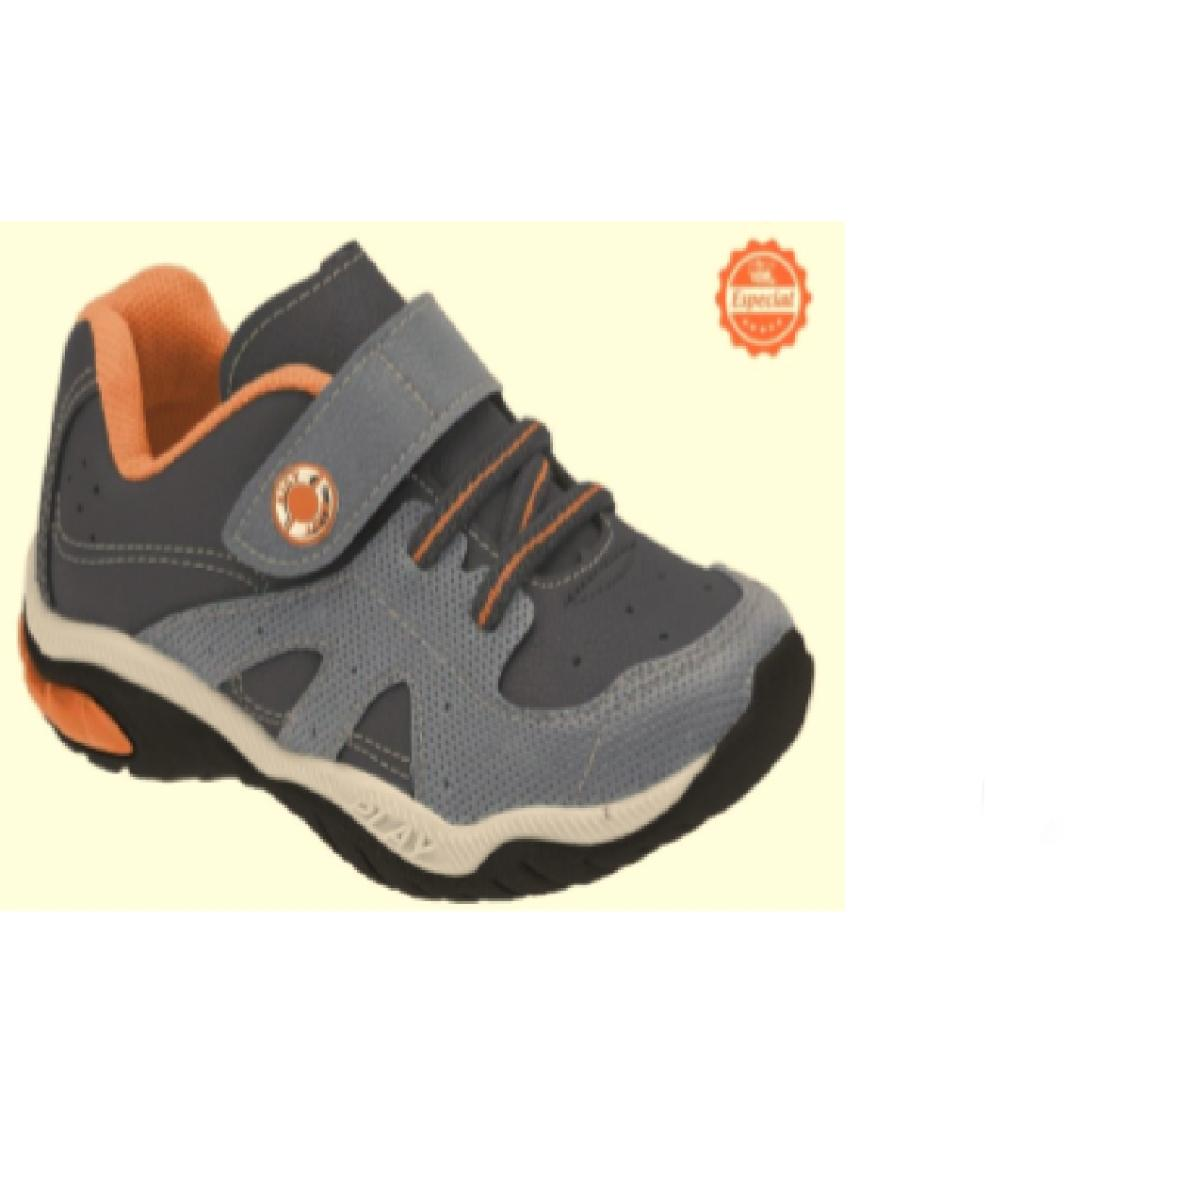 Tênis Masc Infantil Kidy 00705641532 Marinho/azul/laranja